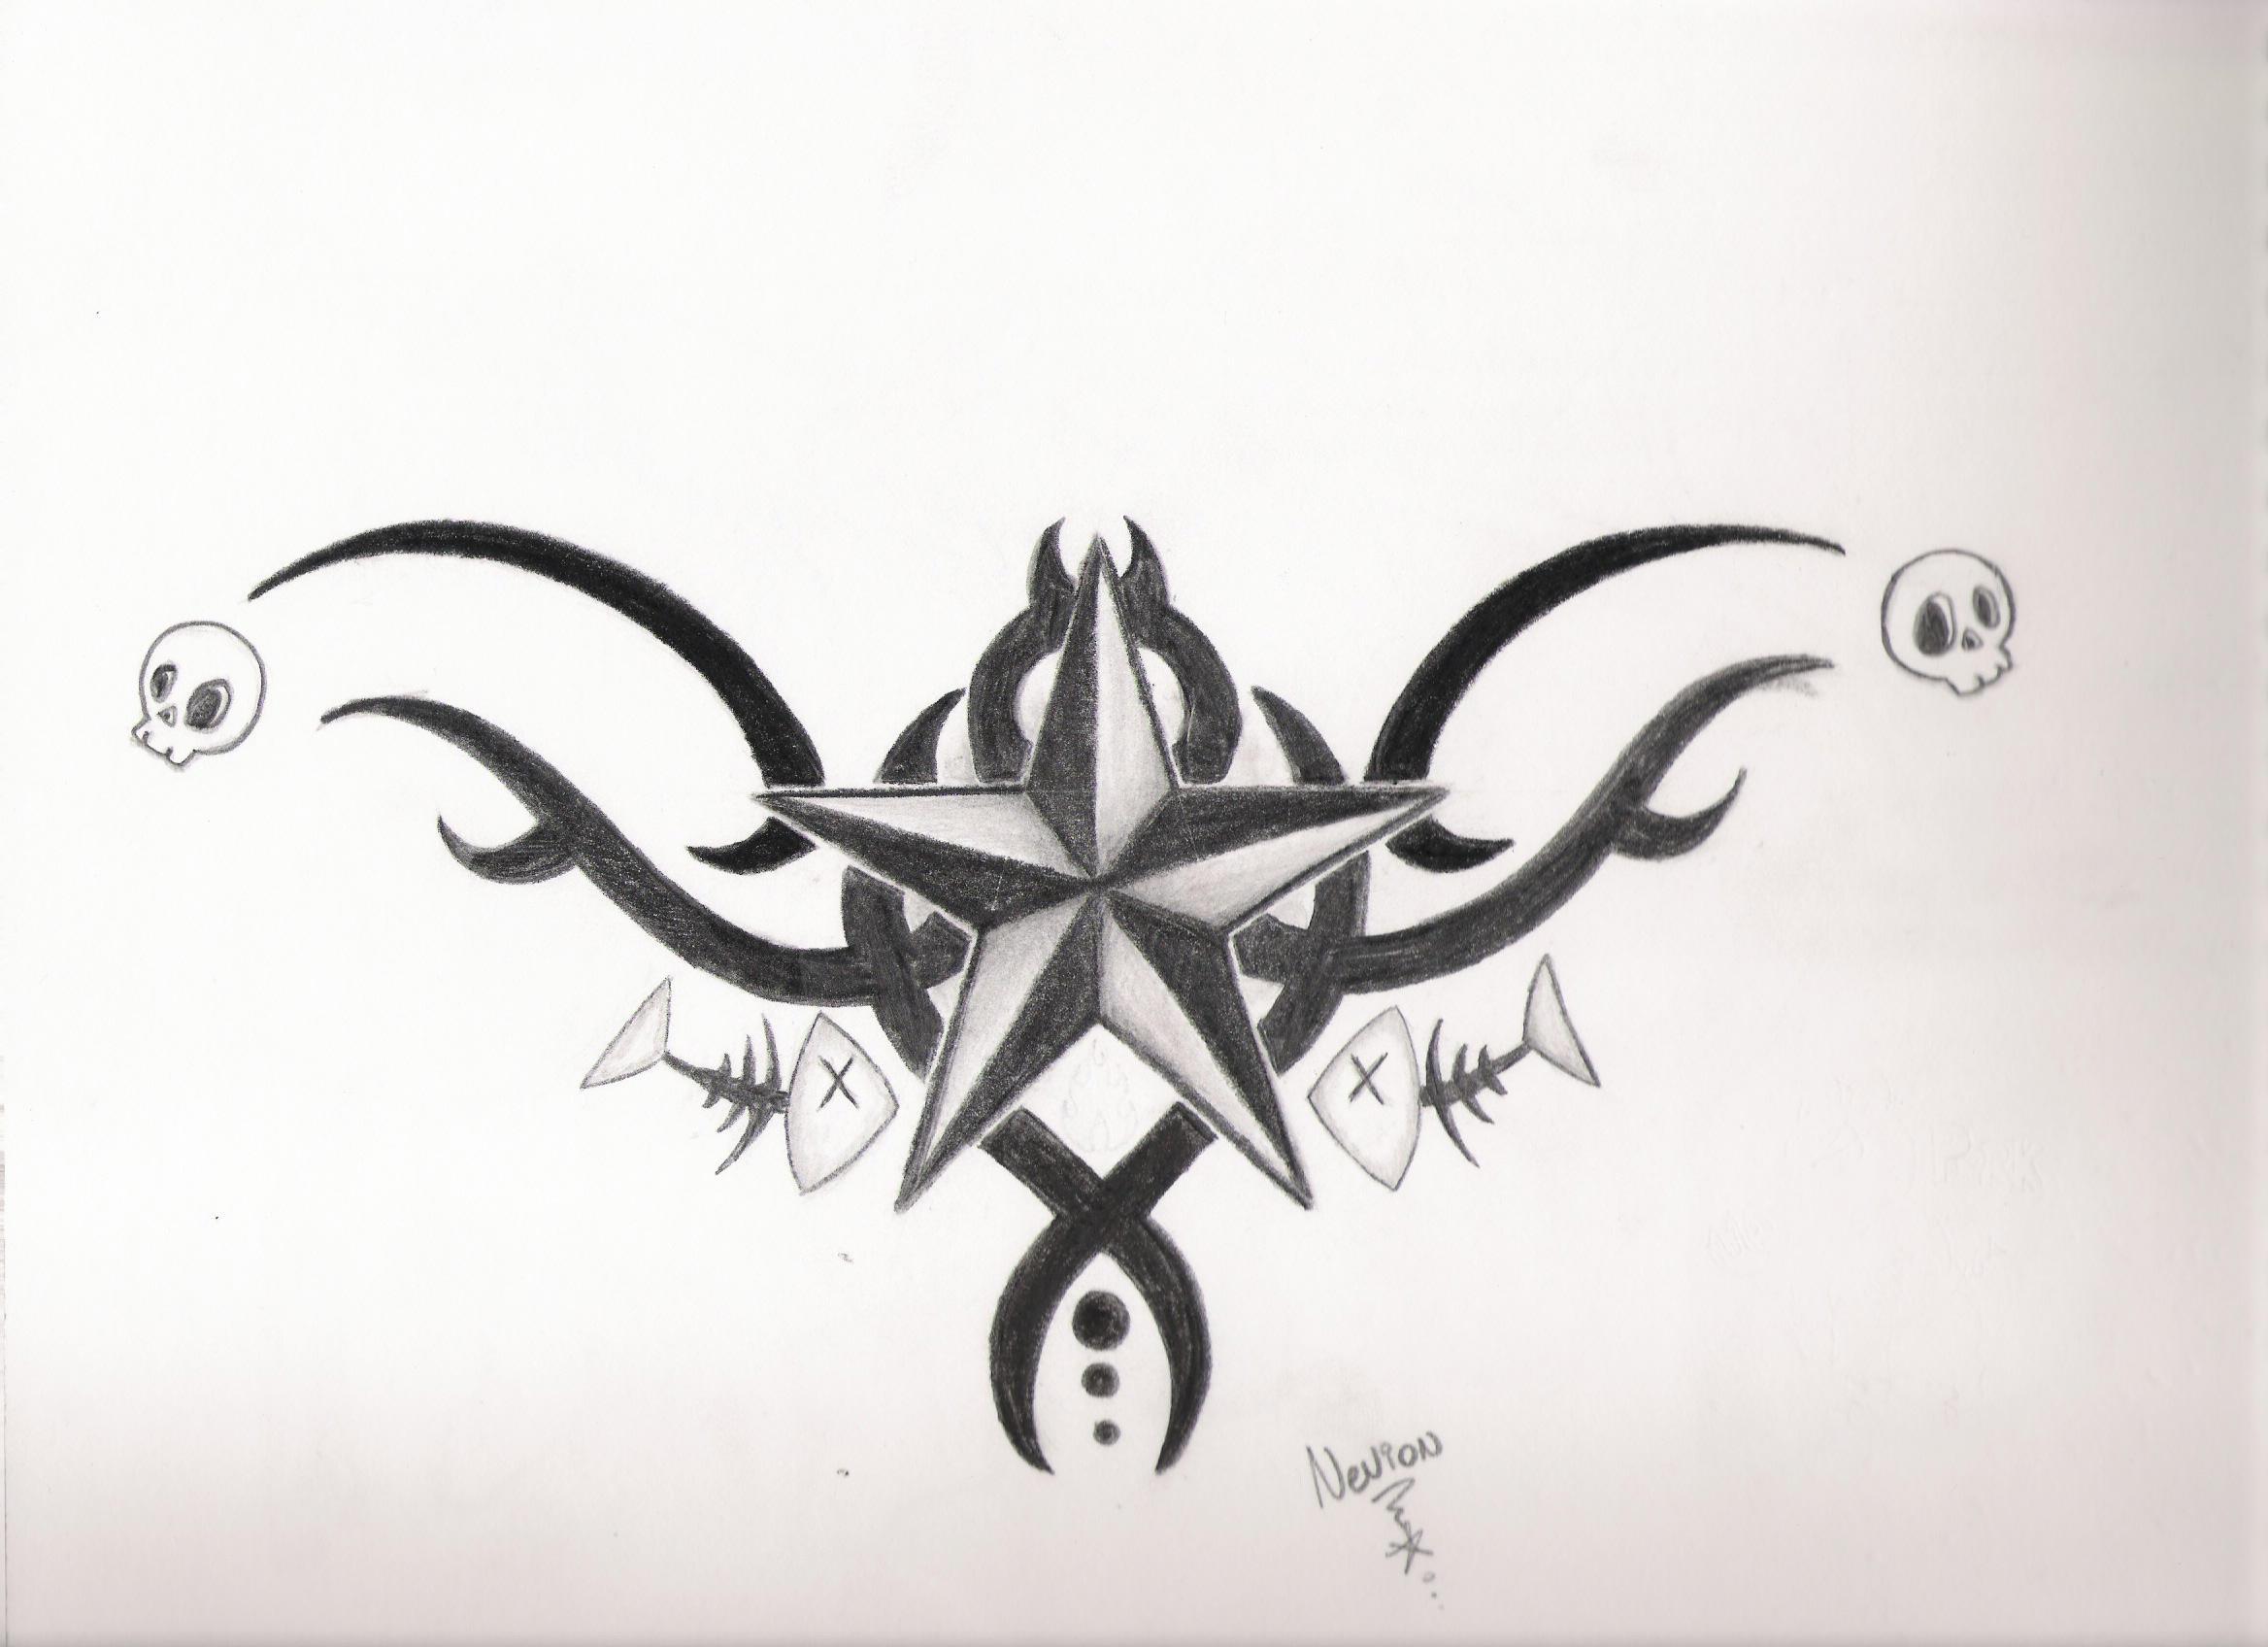 nautical star tattoo design by 8xxnevionxx8 on deviantart. Black Bedroom Furniture Sets. Home Design Ideas